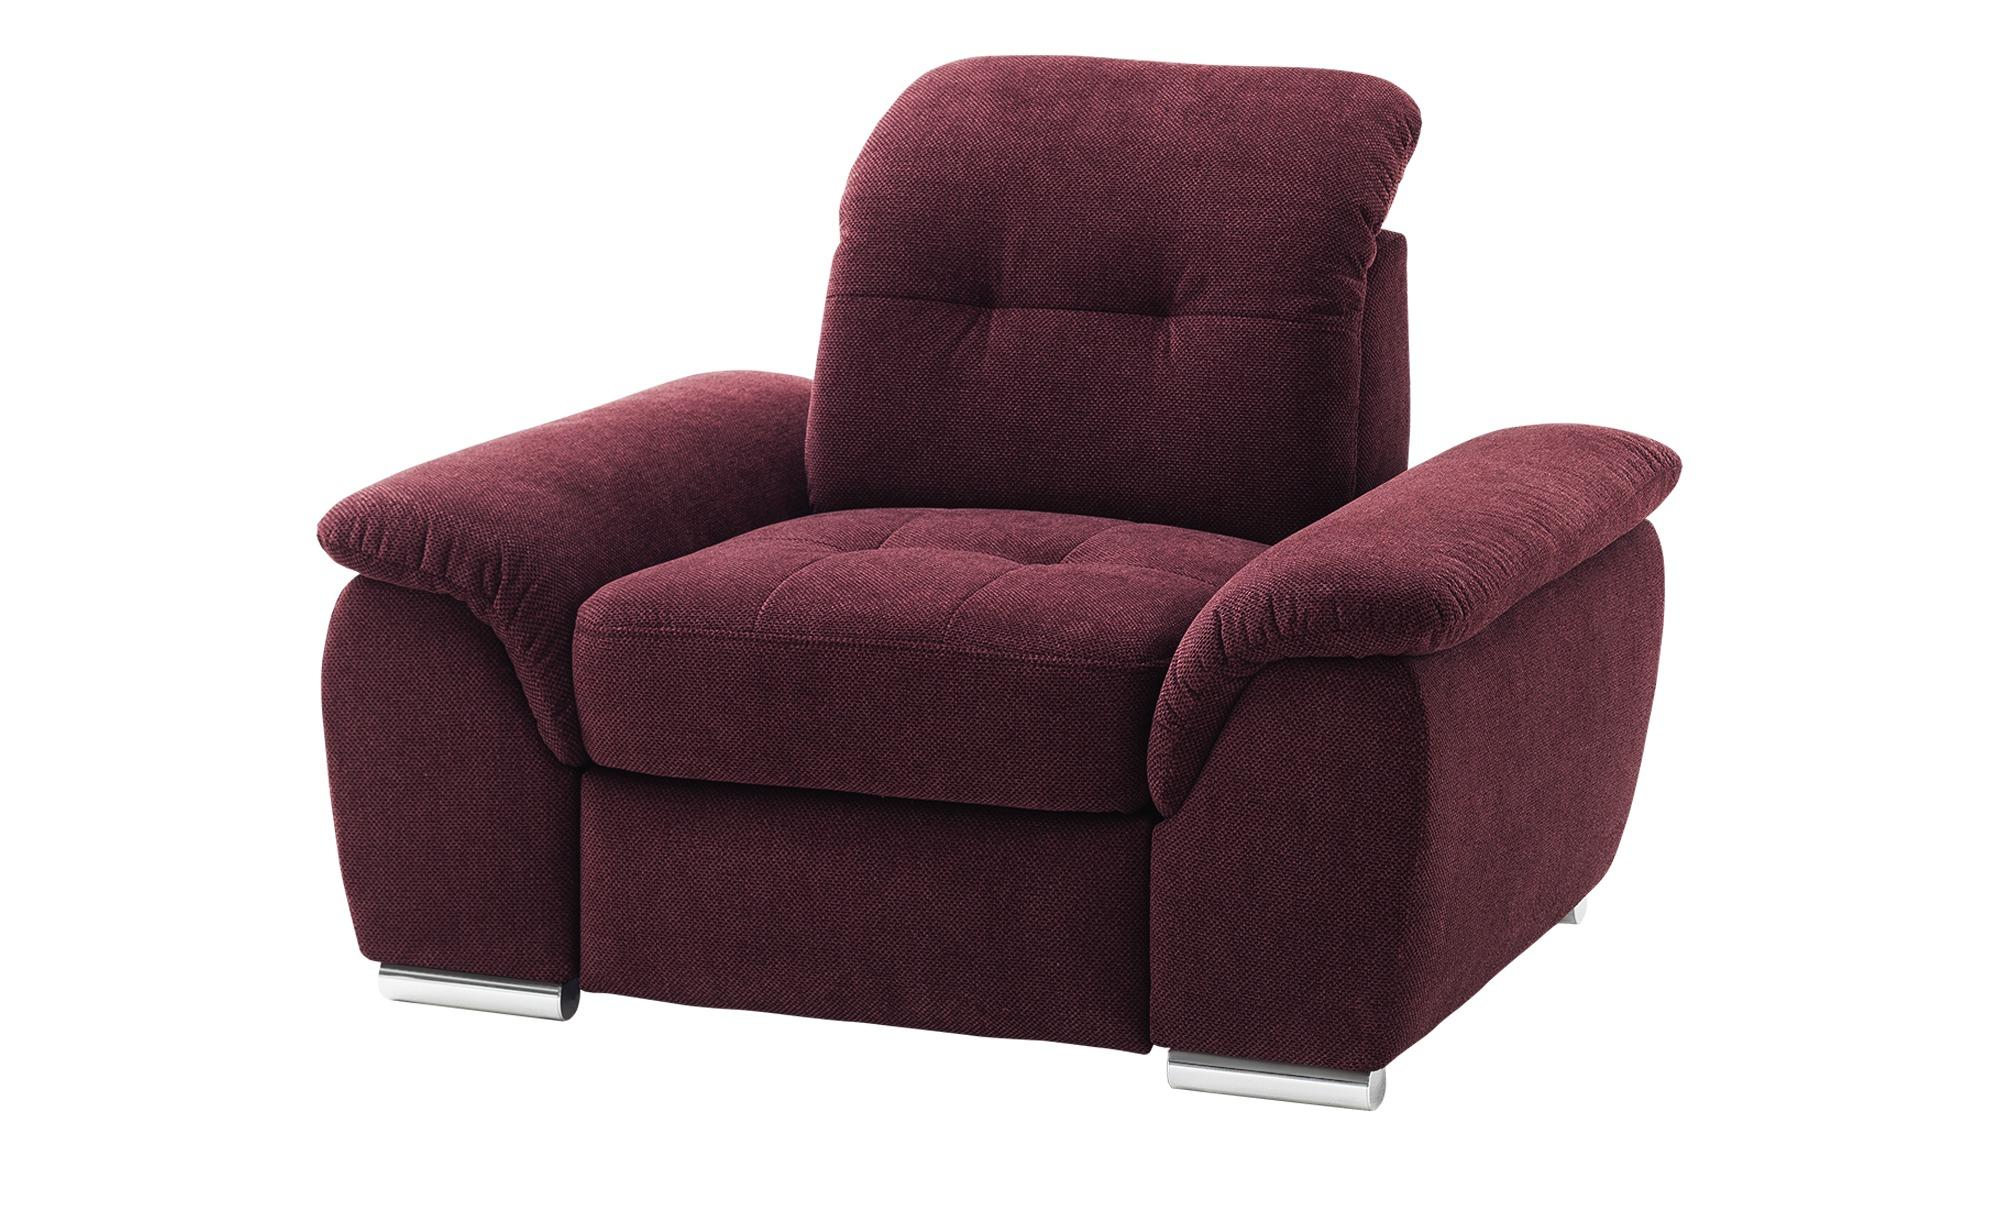 Sessel   Halona ¦ rot ¦ Maße (cm): B: 116 H: 89 T: 109 Polstermöbel > Sessel > Polstersessel - Höffner